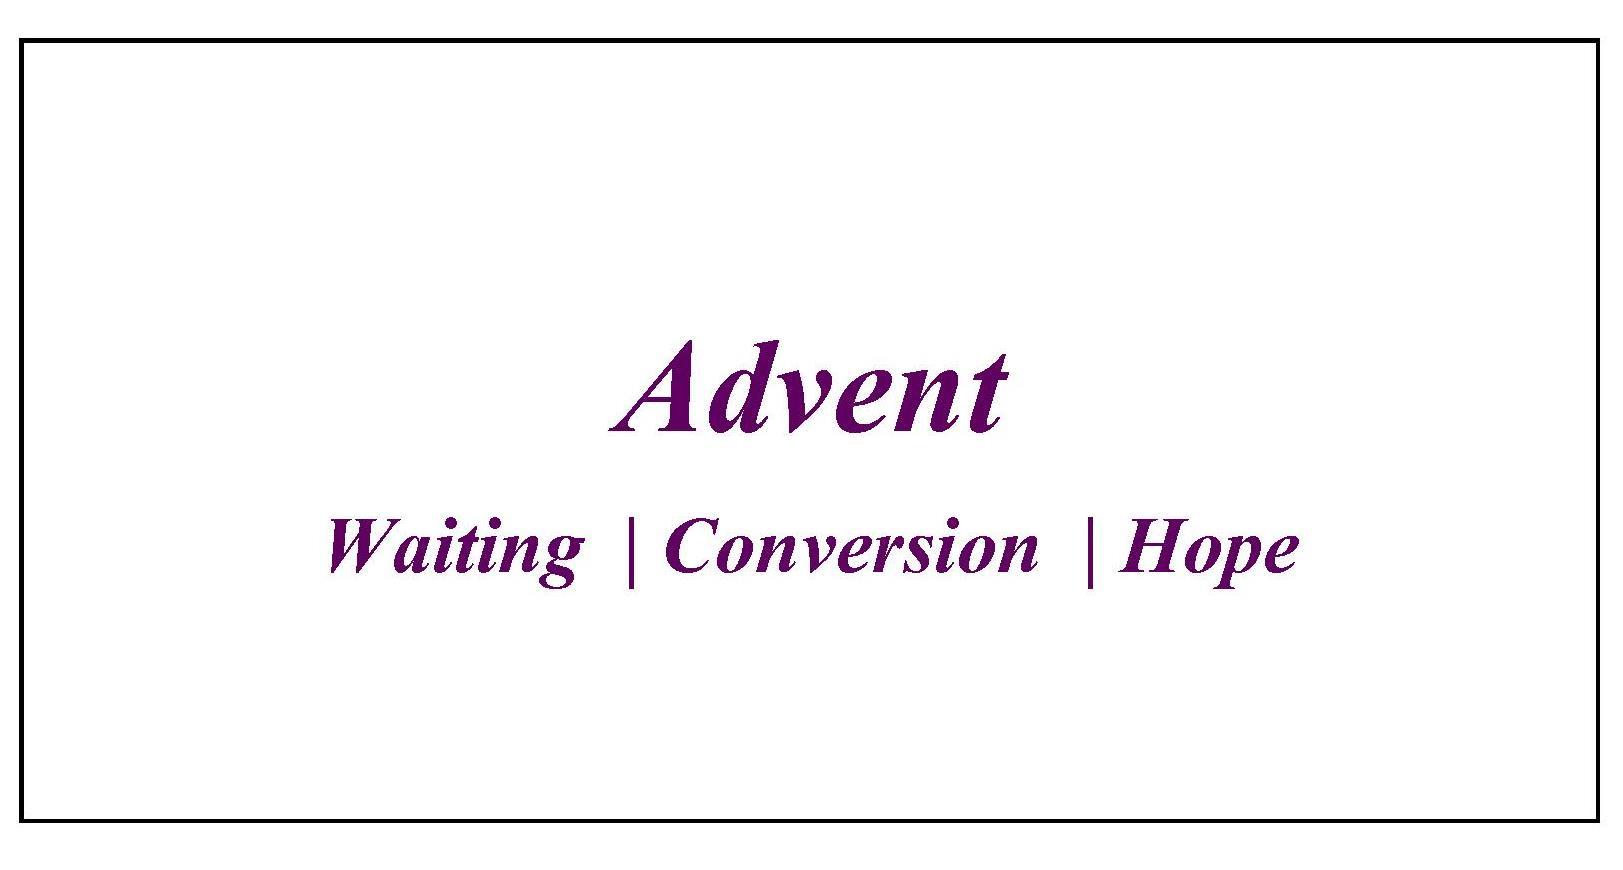 Advent Image 1